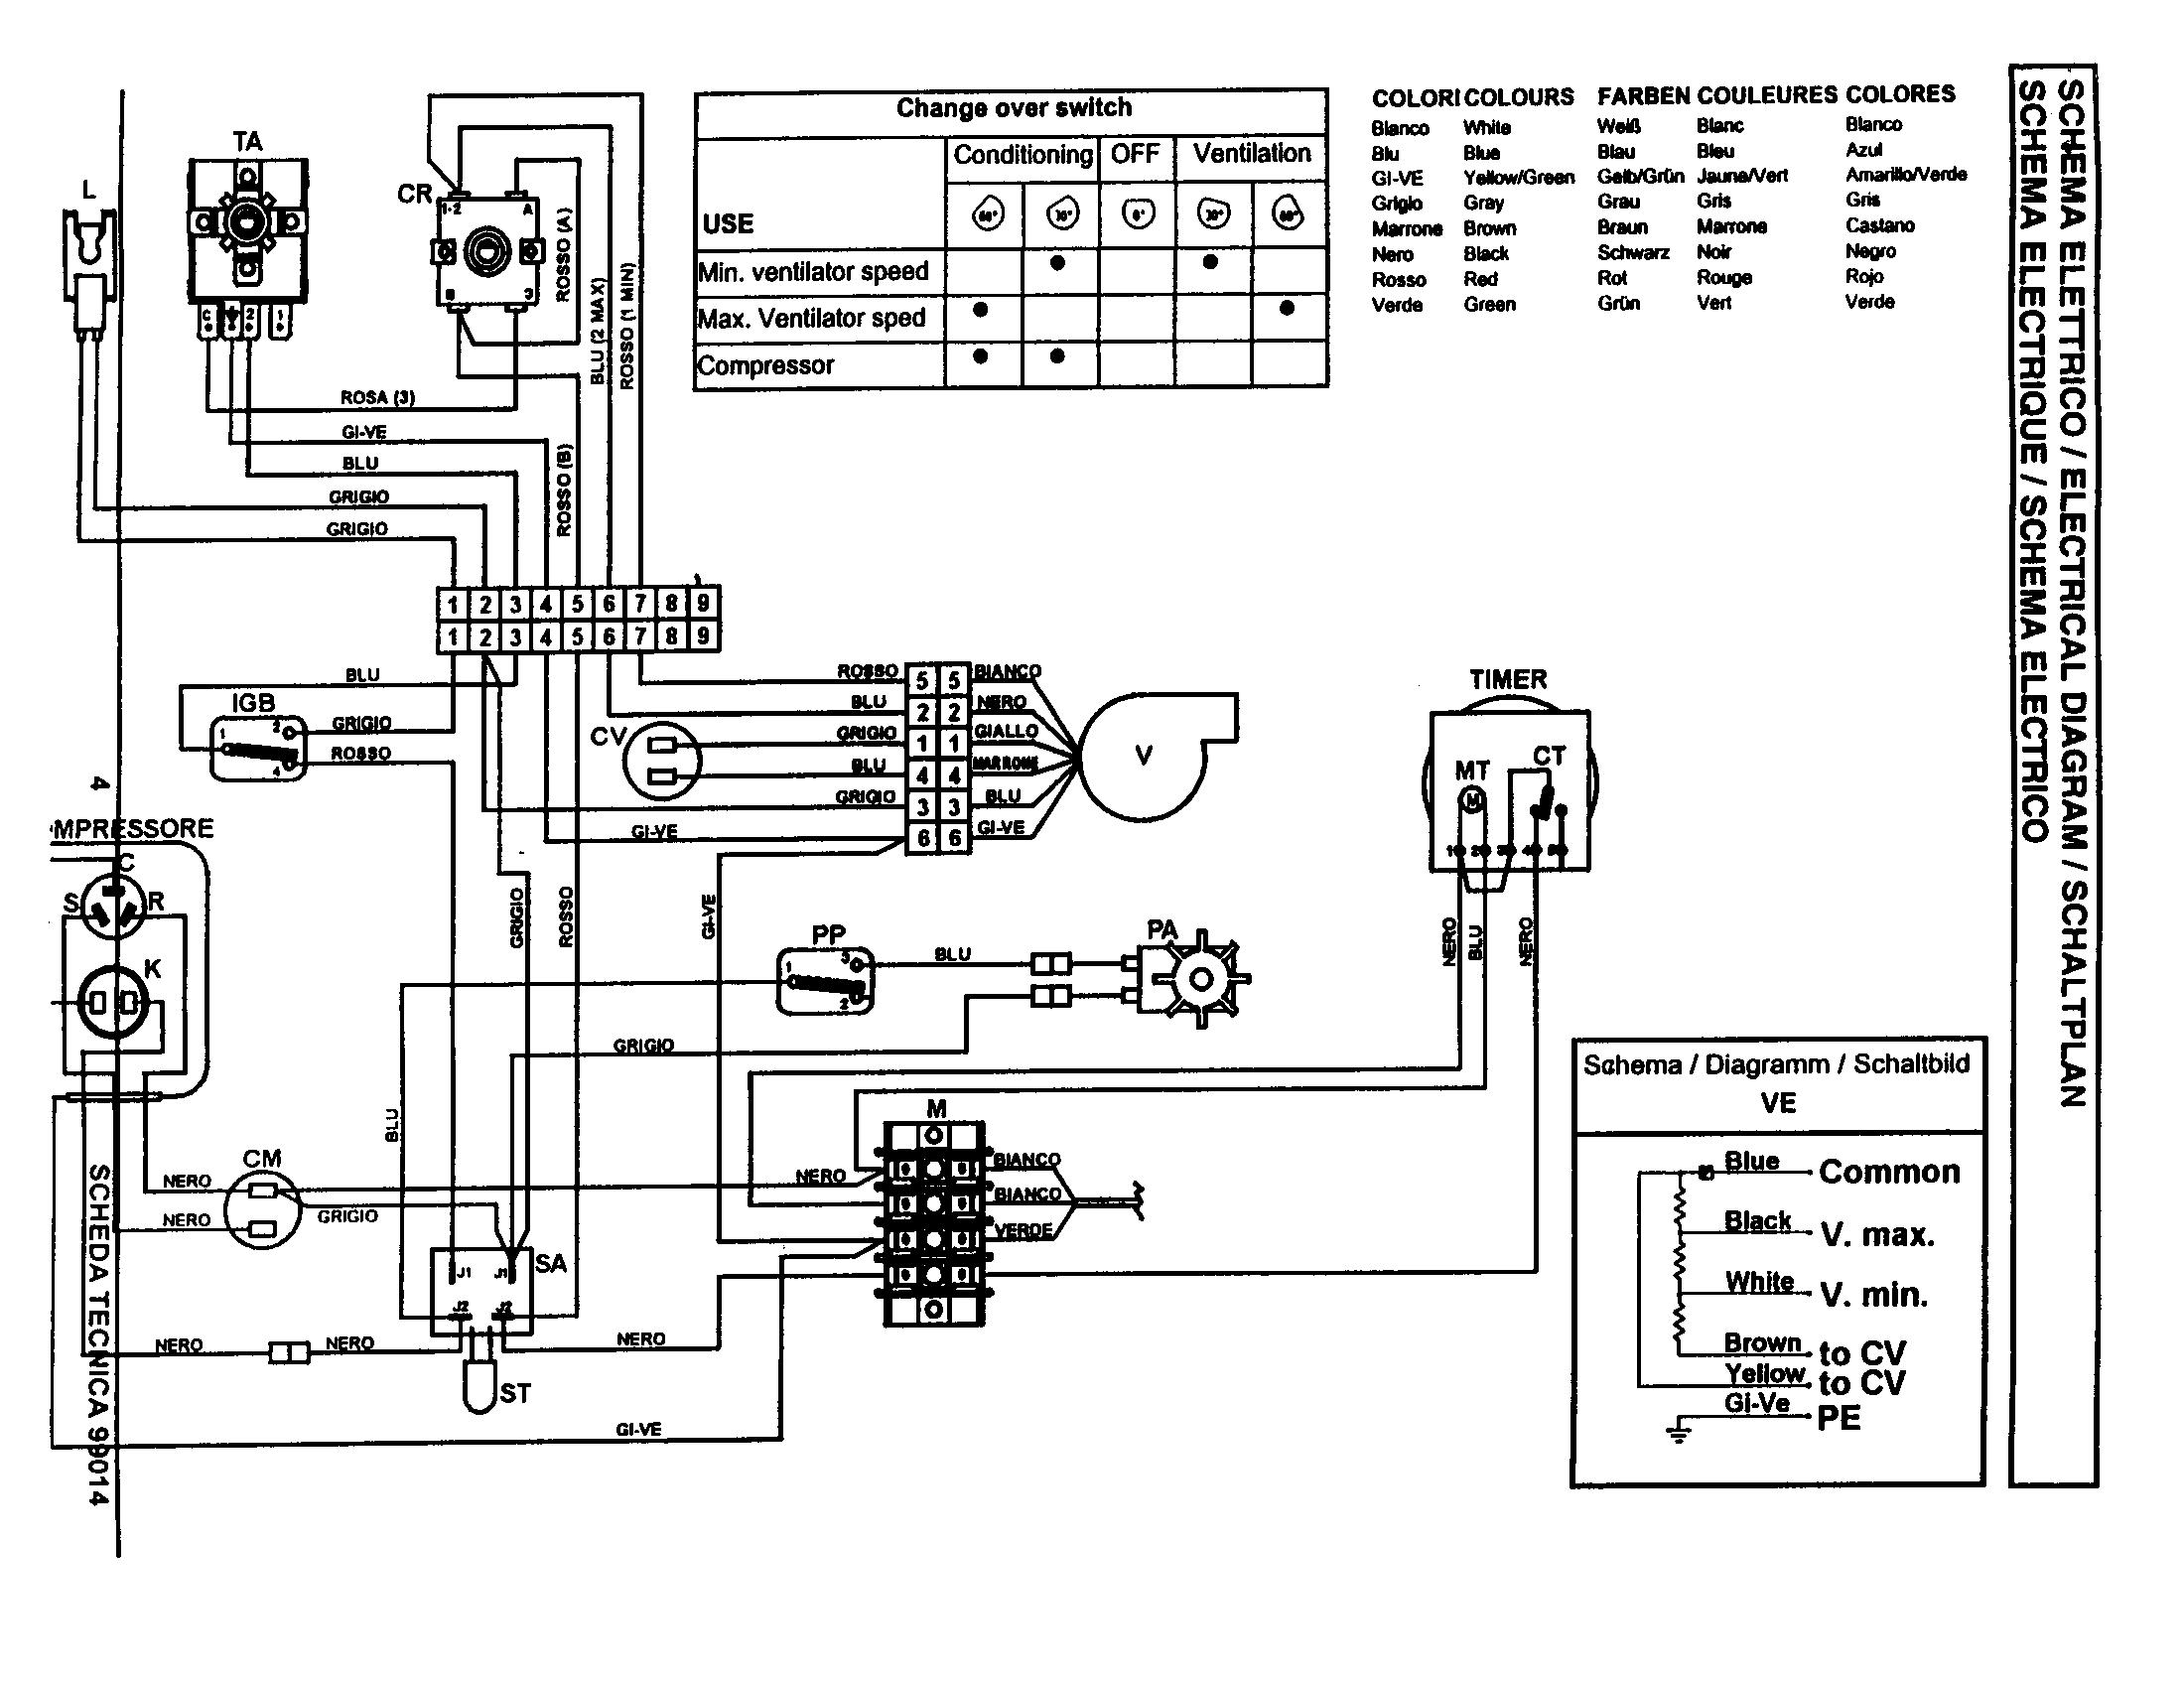 hight resolution of 2010 camaro ac schematic